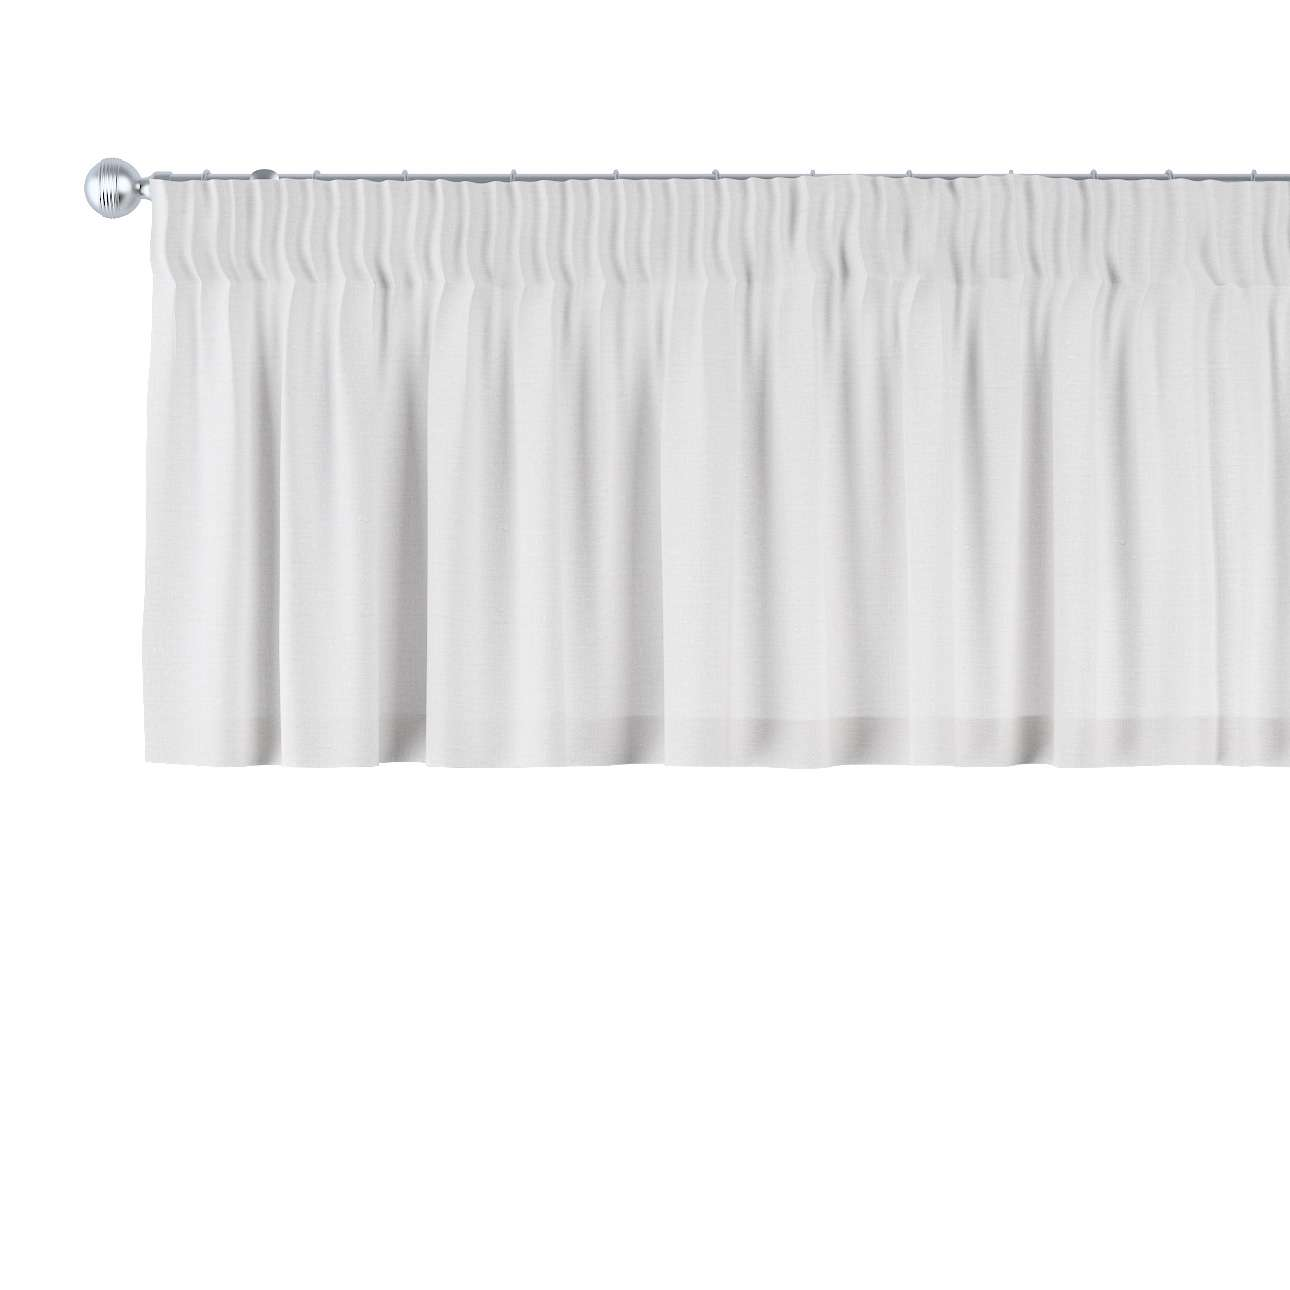 Gardinkappa med rynkband 130 × 40 cm i kollektionen Linne, Tyg: 392-04